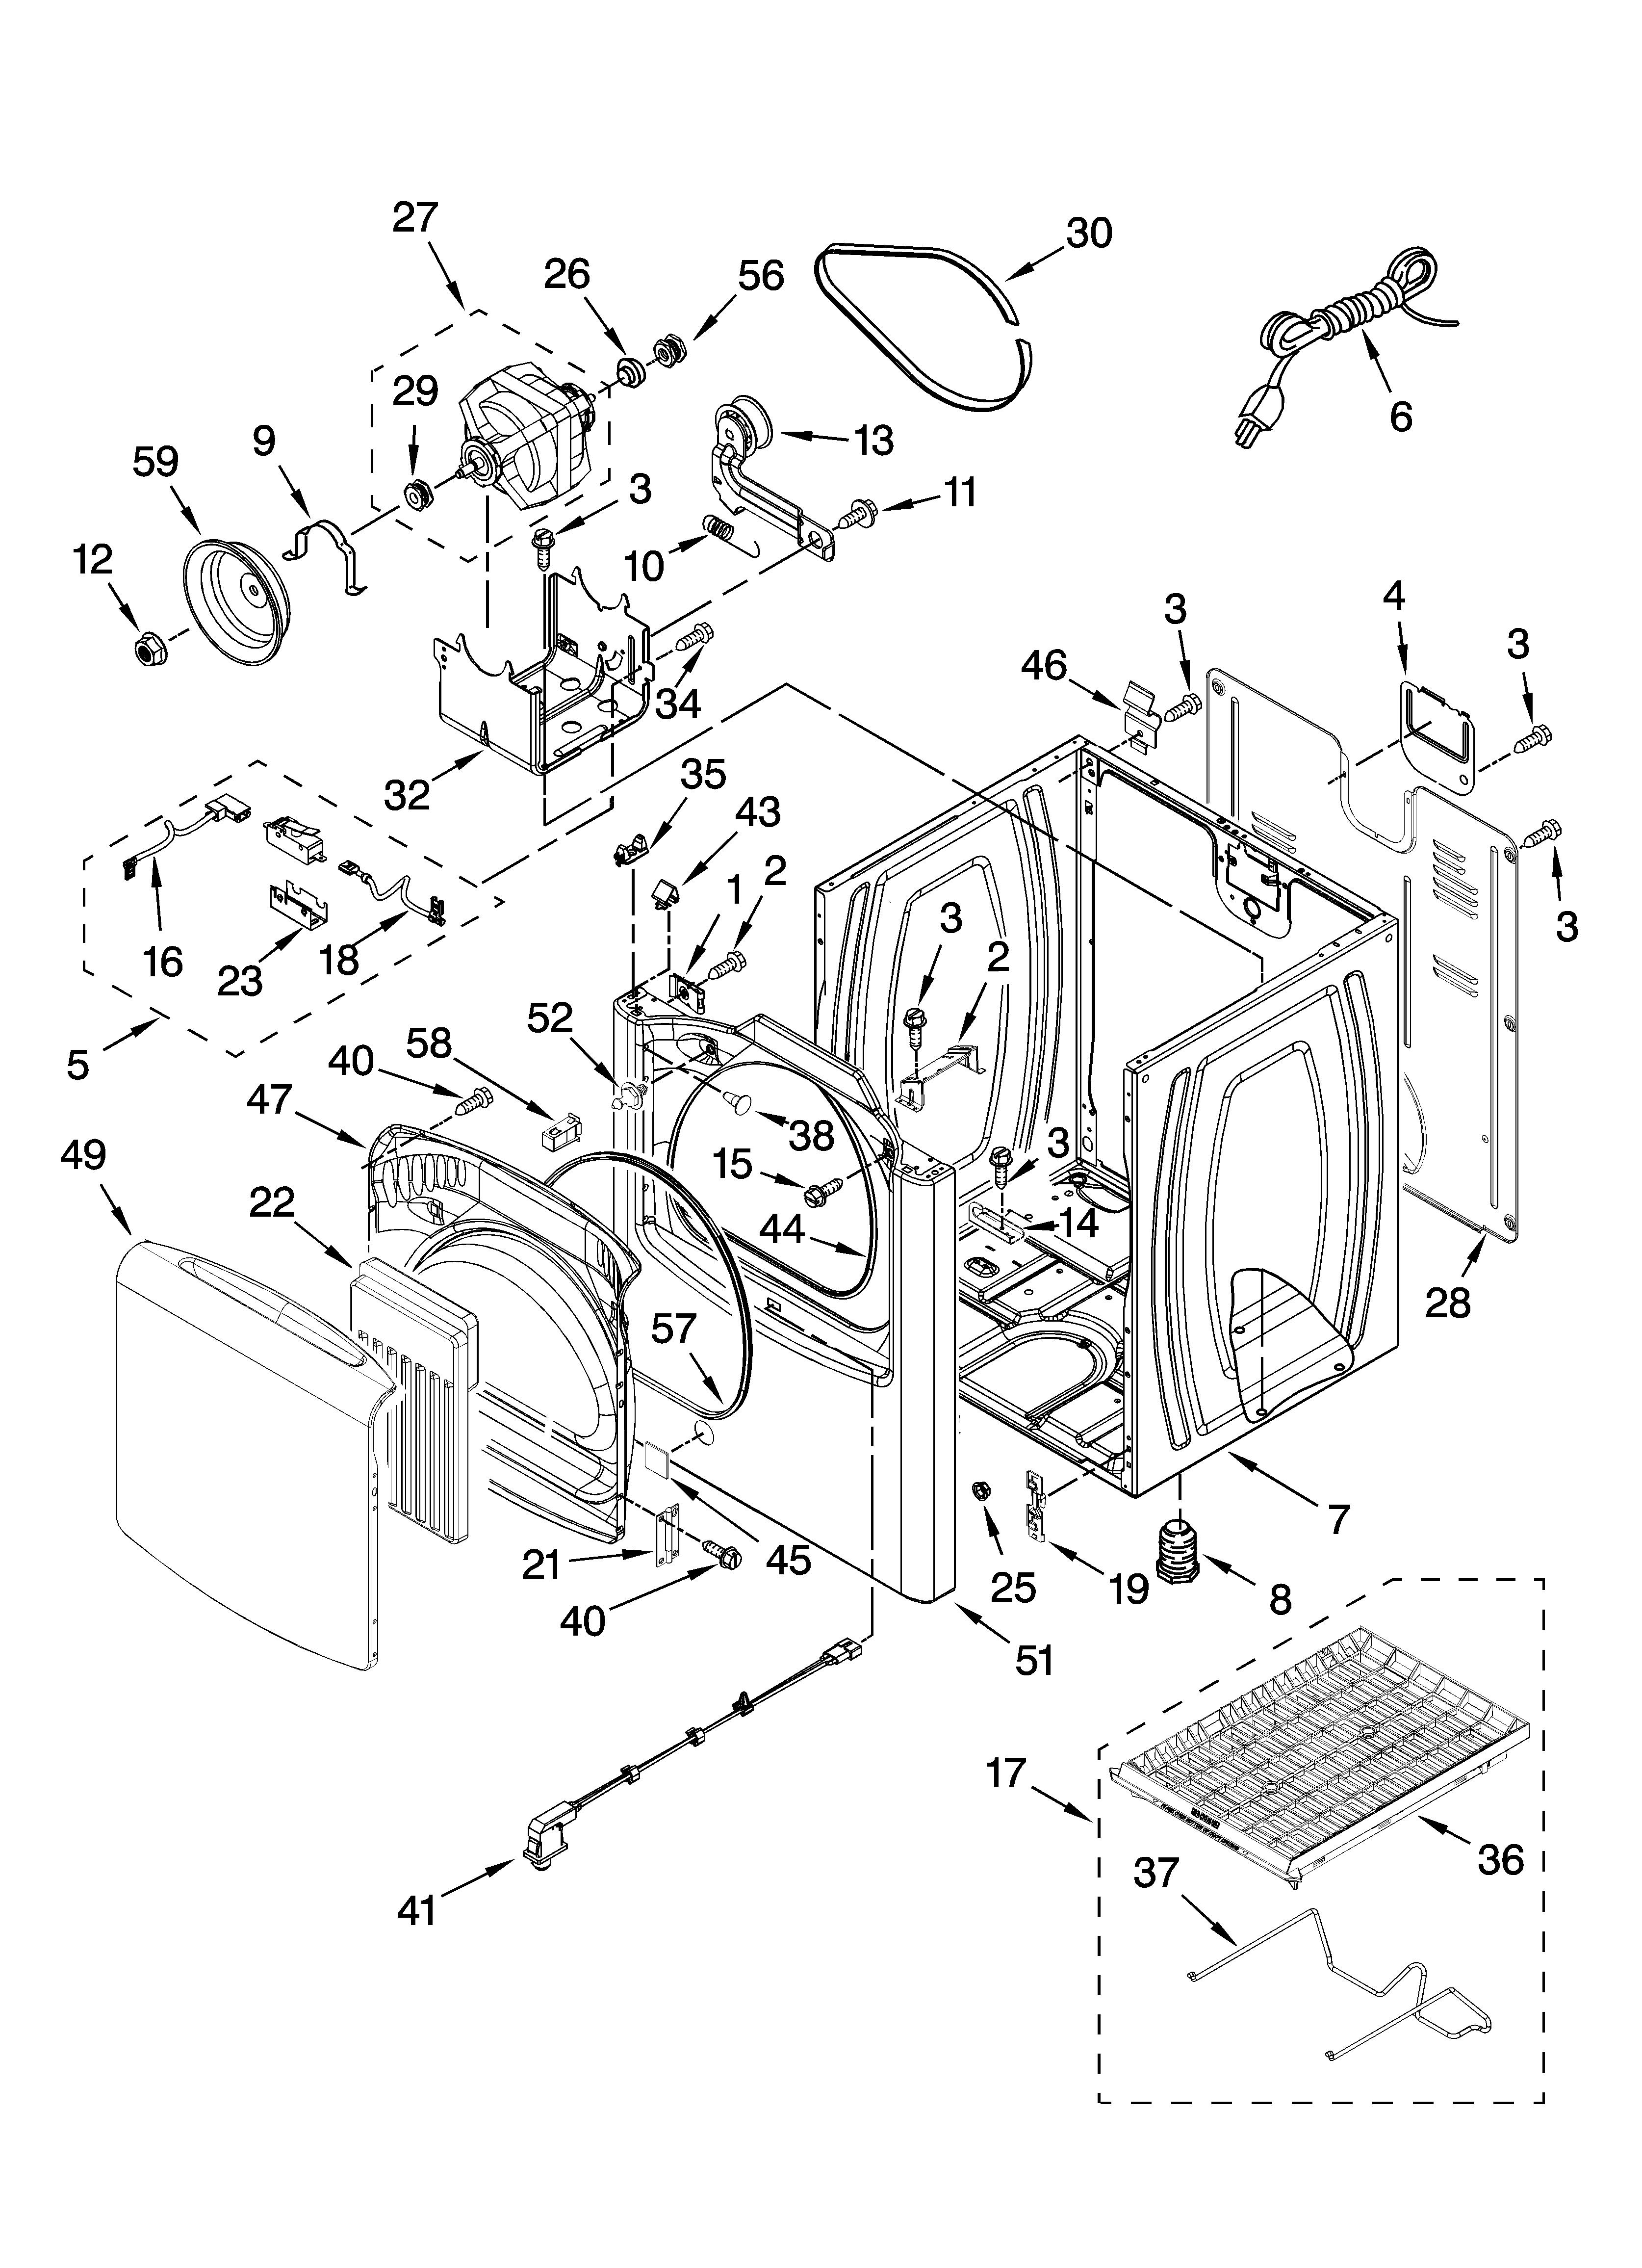 Wiring Diagram He4 110 85866401